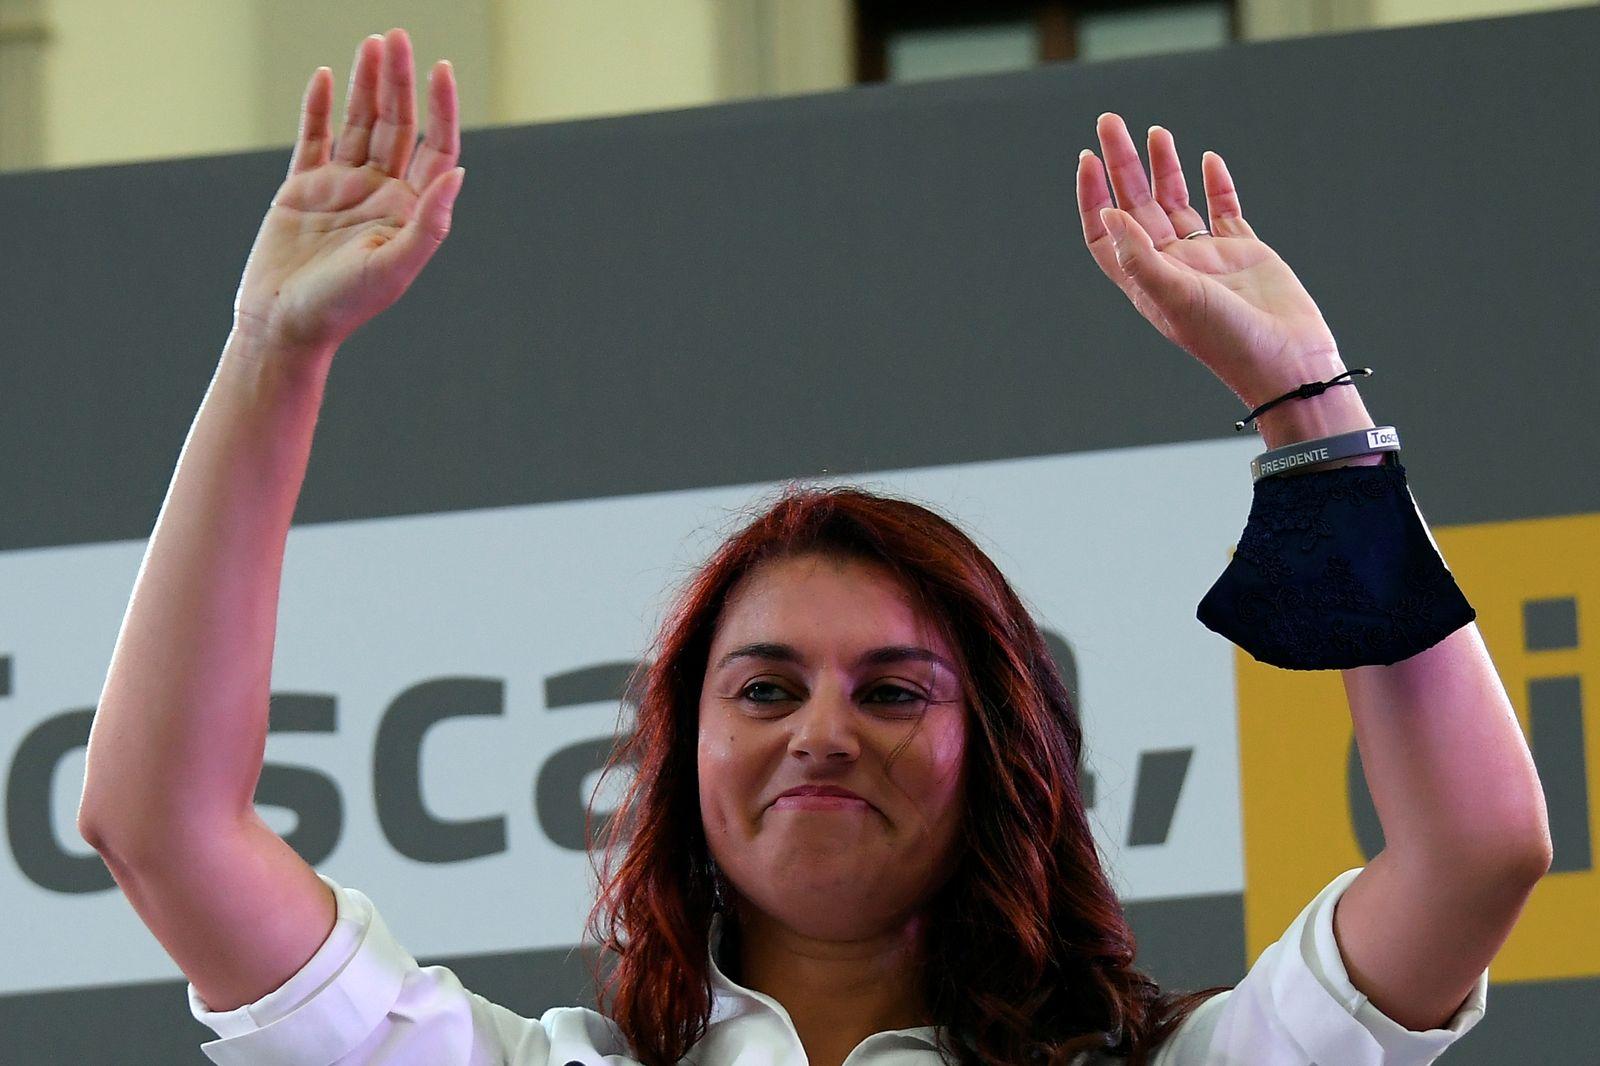 Right-wing leaders Matteo Salvini, Antonio Tajani and Giorgia Meloni close their electoral campaign in Florence